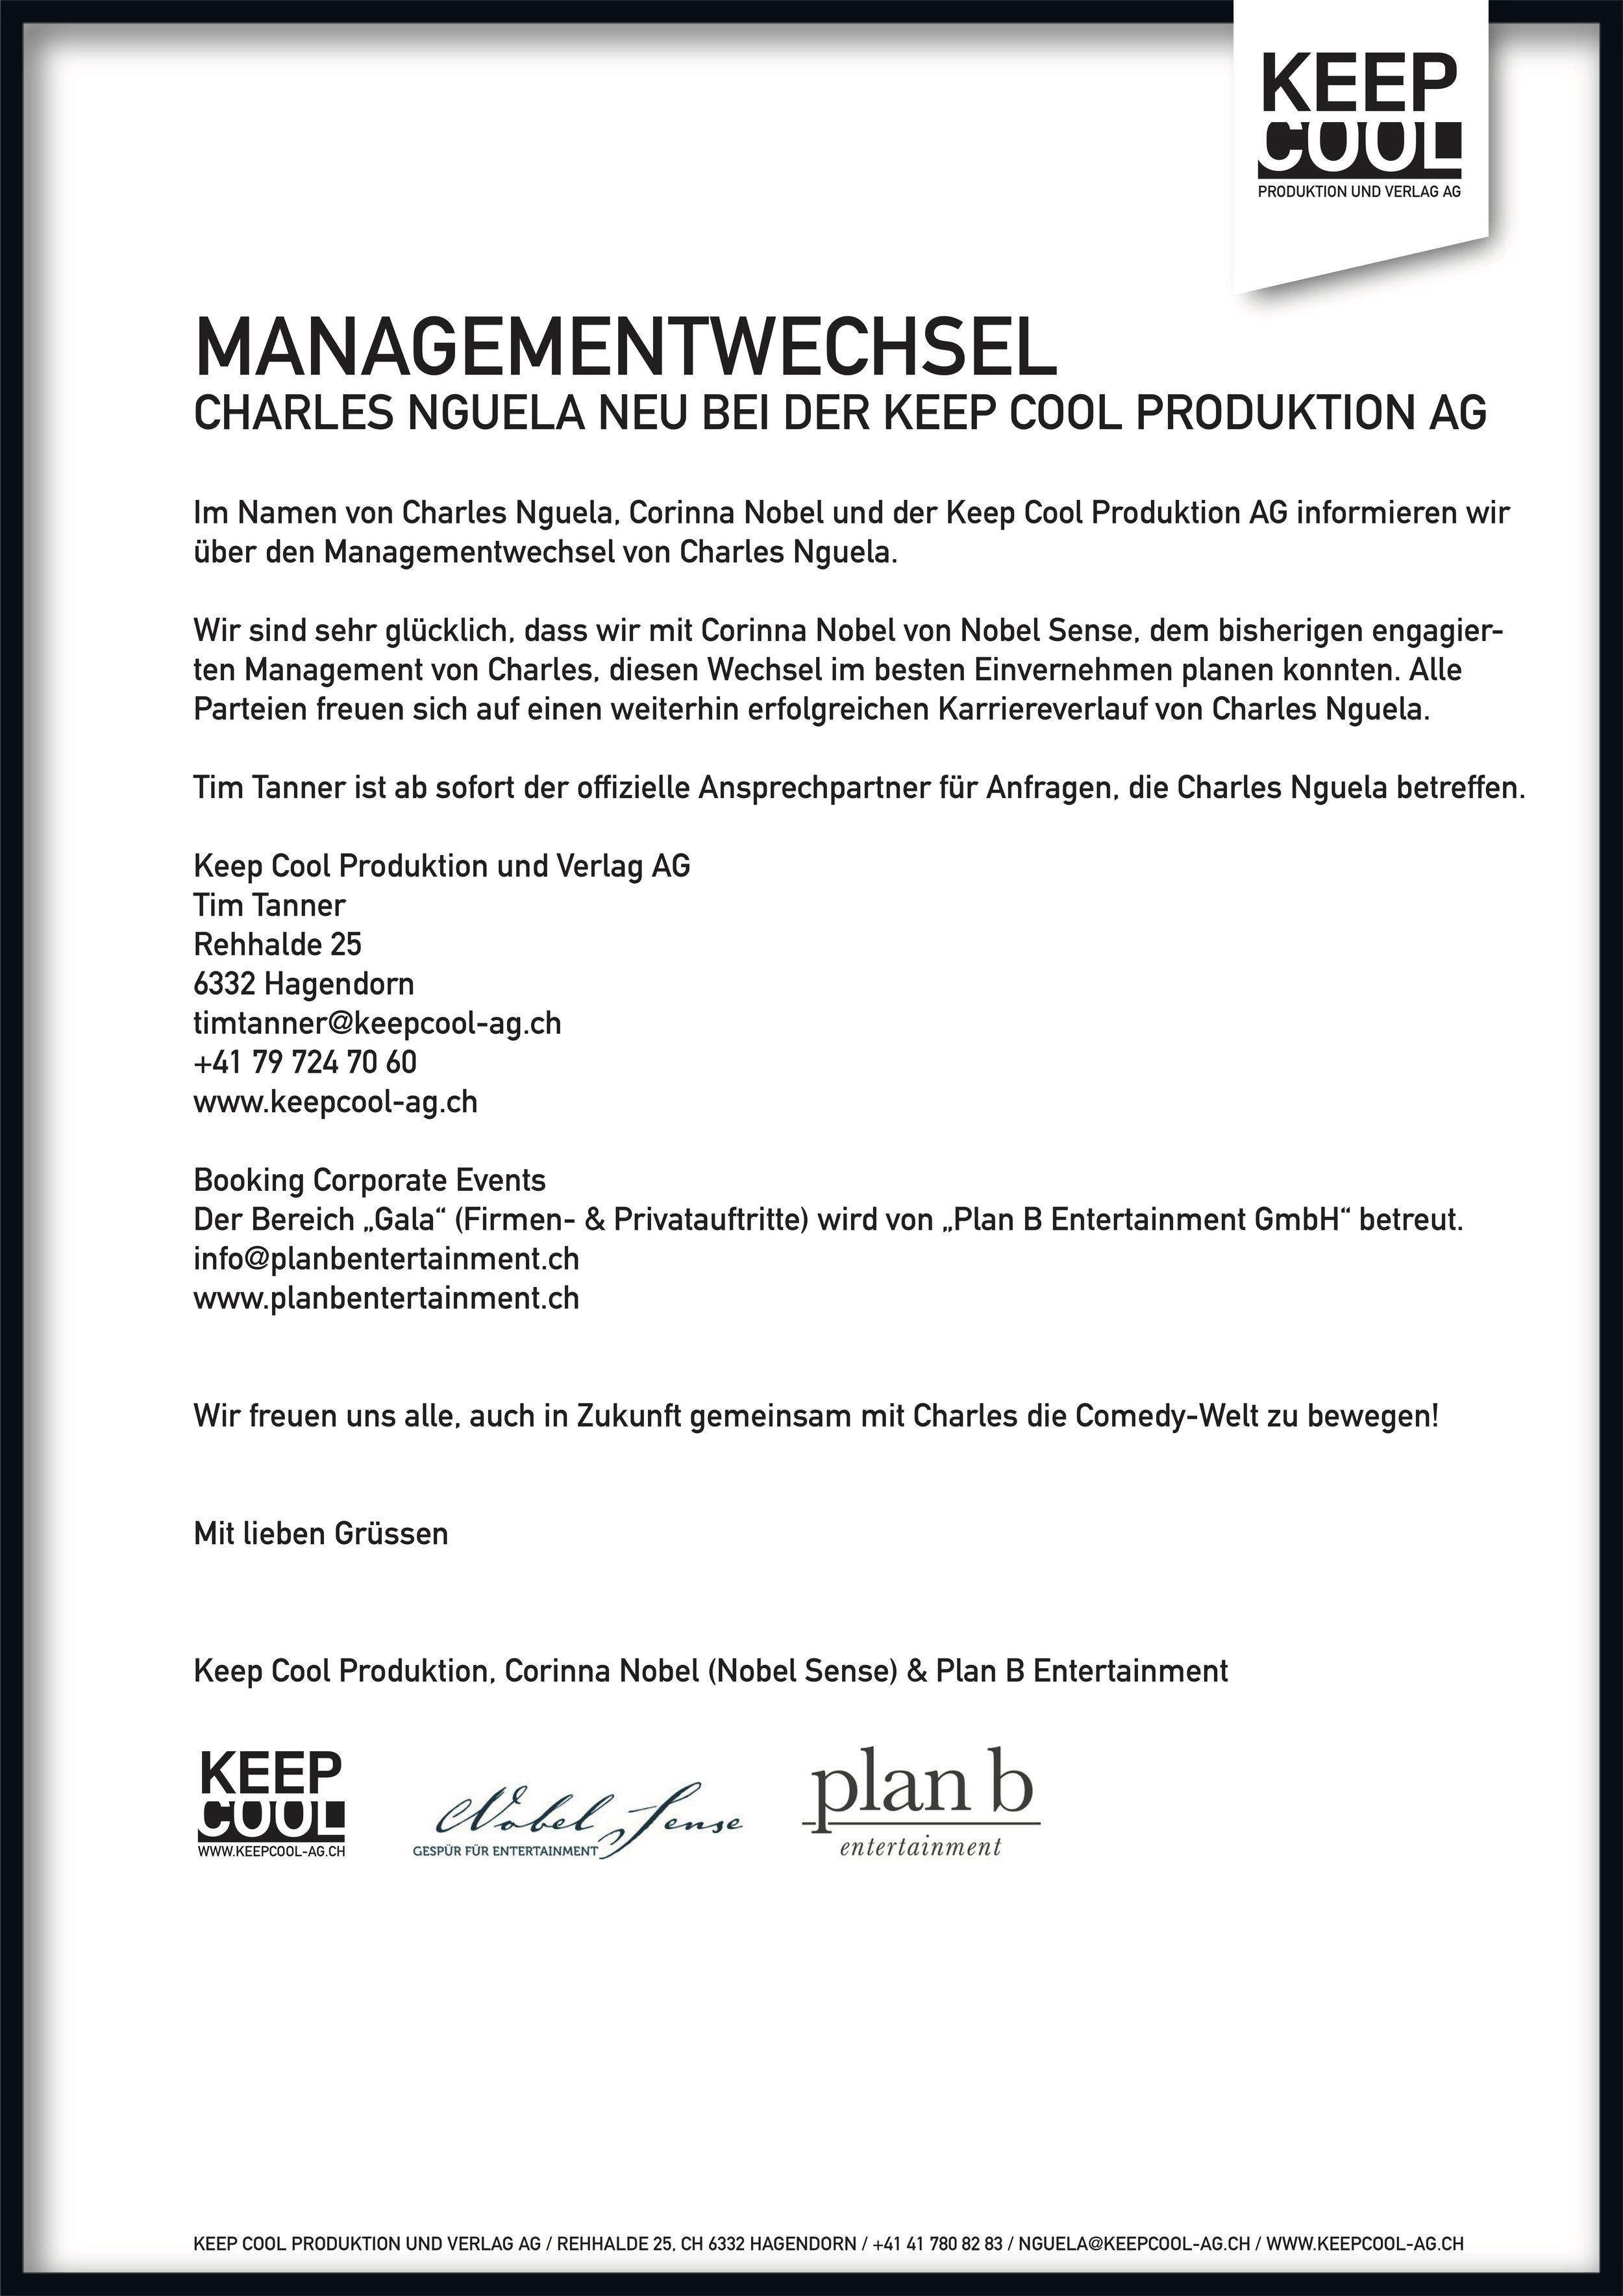 CN_Managementwechsel.jpg